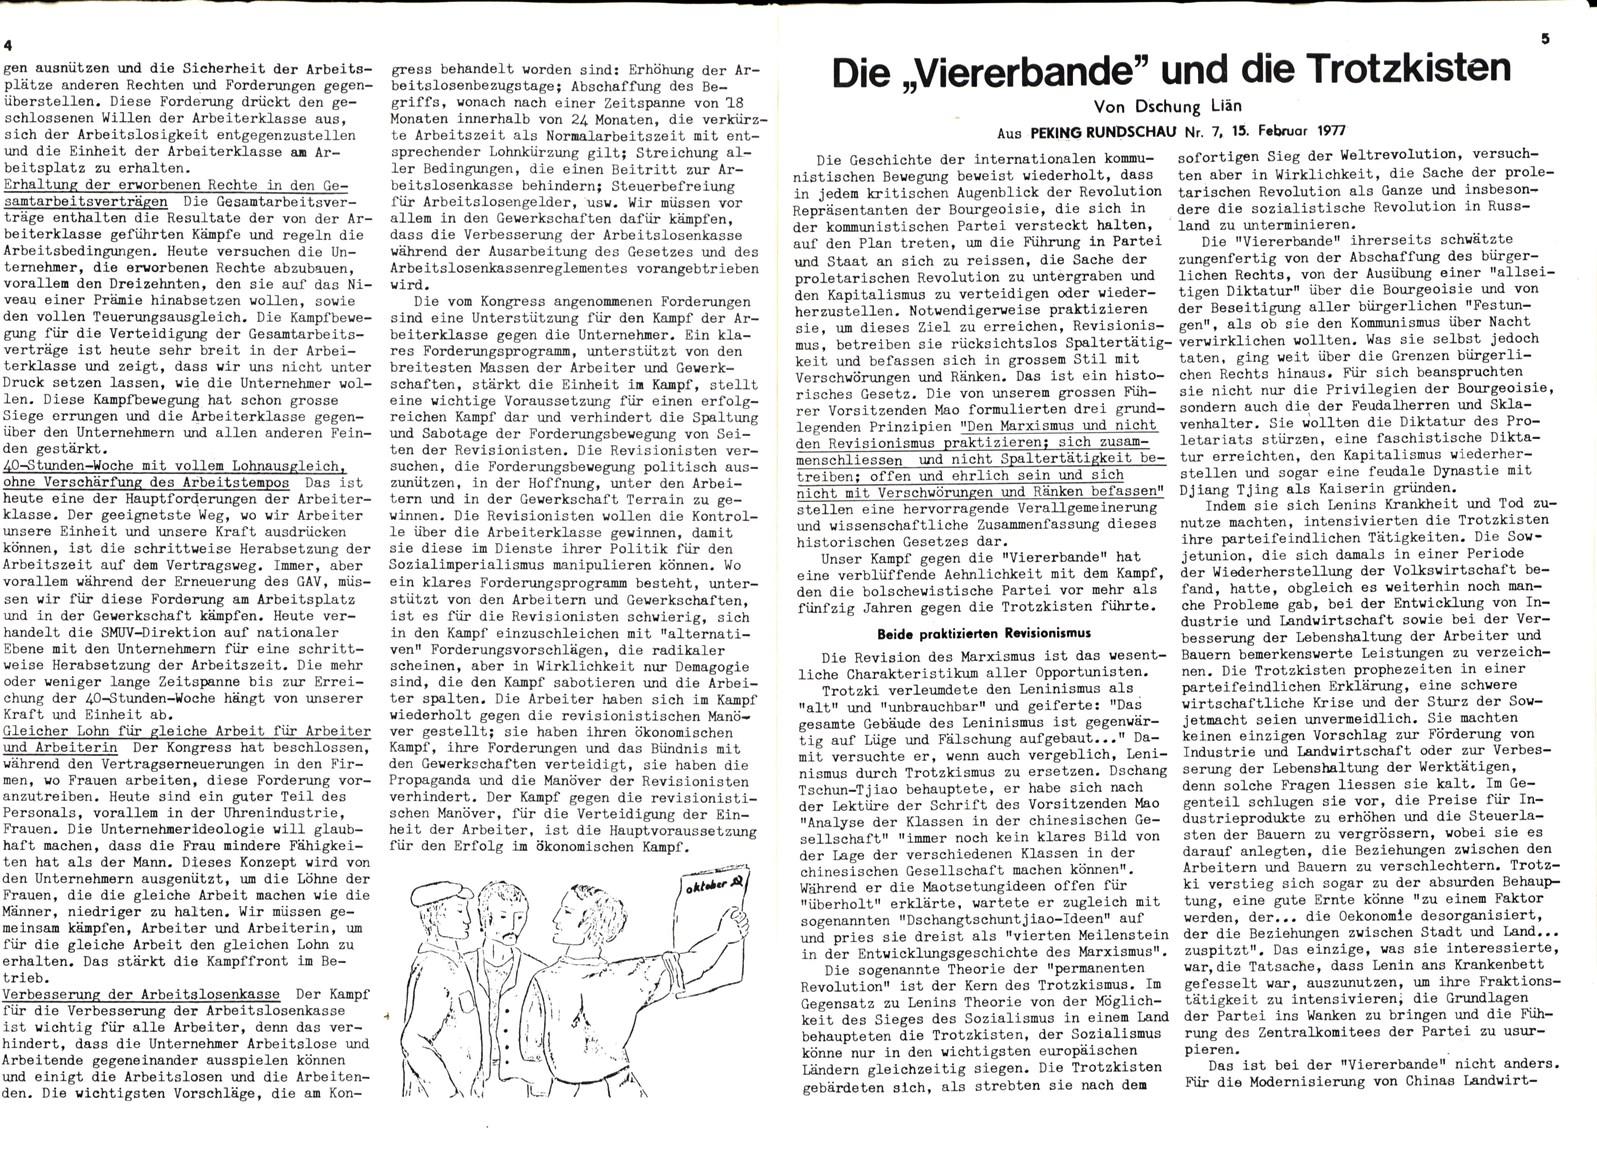 Schweiz_KPSML_Oktober_19770400_109_003